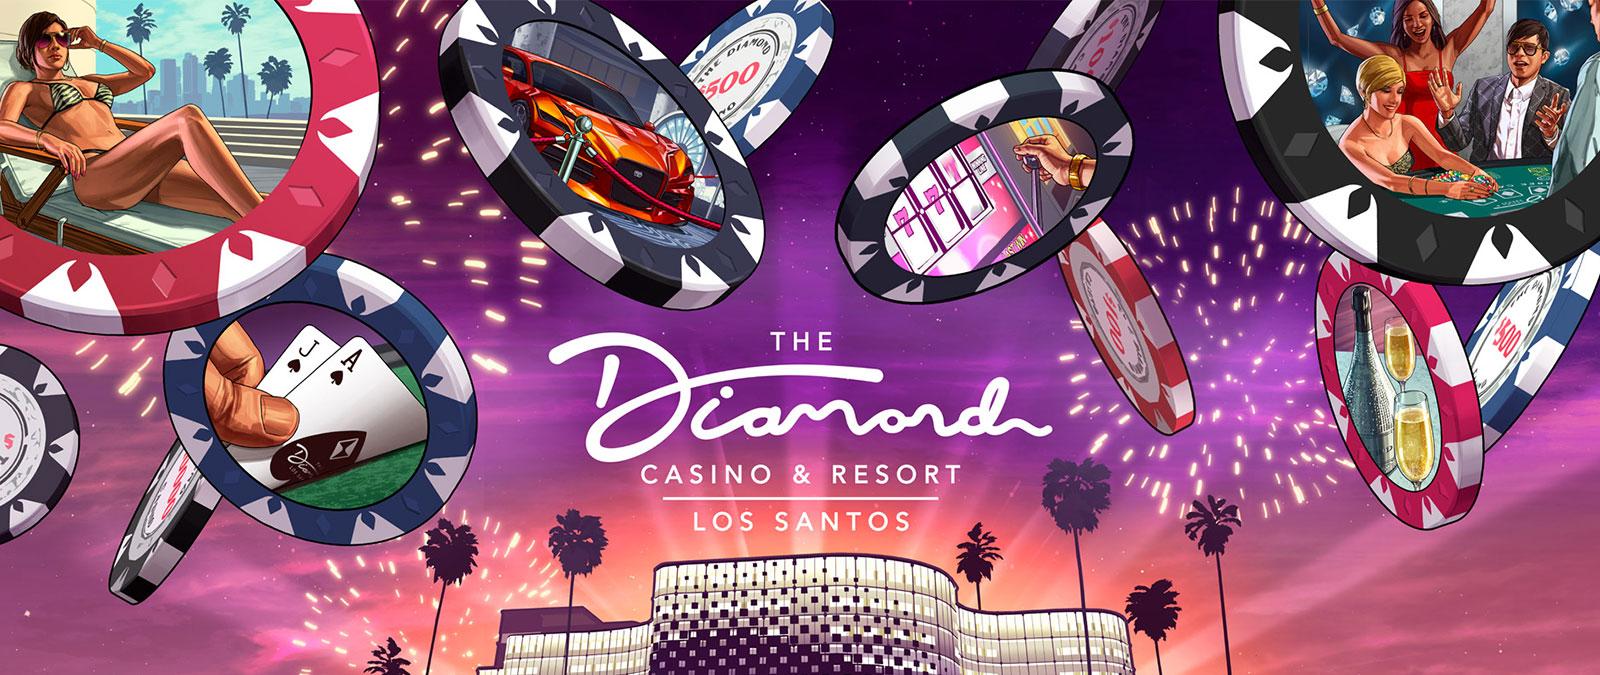 The Diamond Casino & Resort, Los Santos 標誌,種植棕櫚樹、旁有煙火的建築物,以及印著不同影像的賭場籌碼落下的正面圖